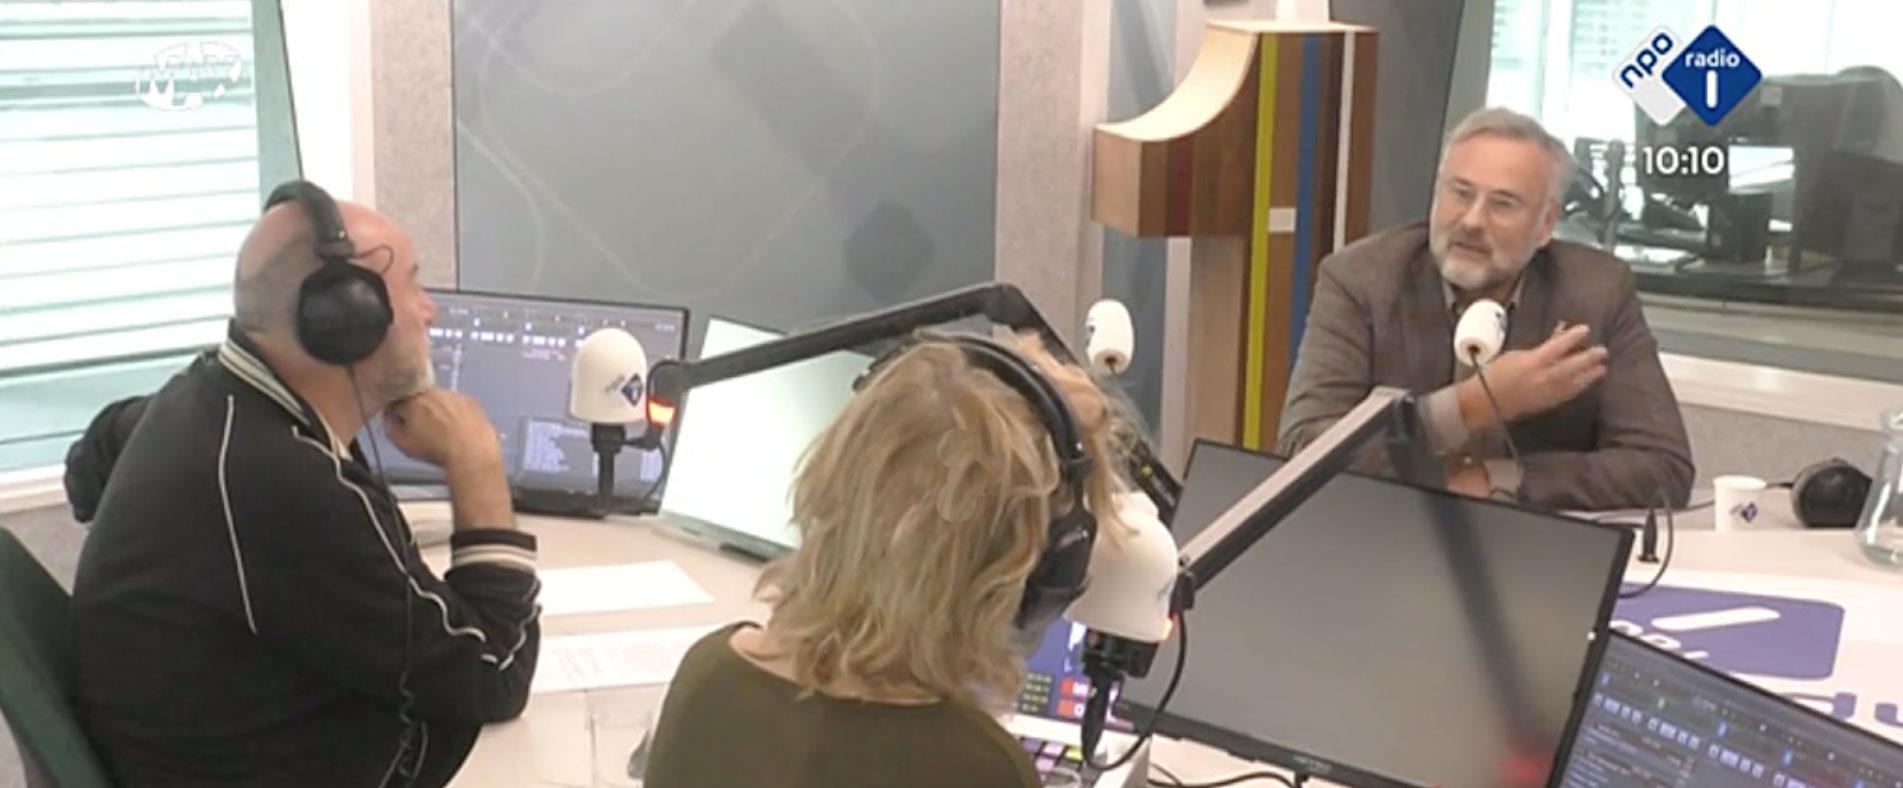 Radio 1: Titanenstrijd tegen korte termijn kapitalisten